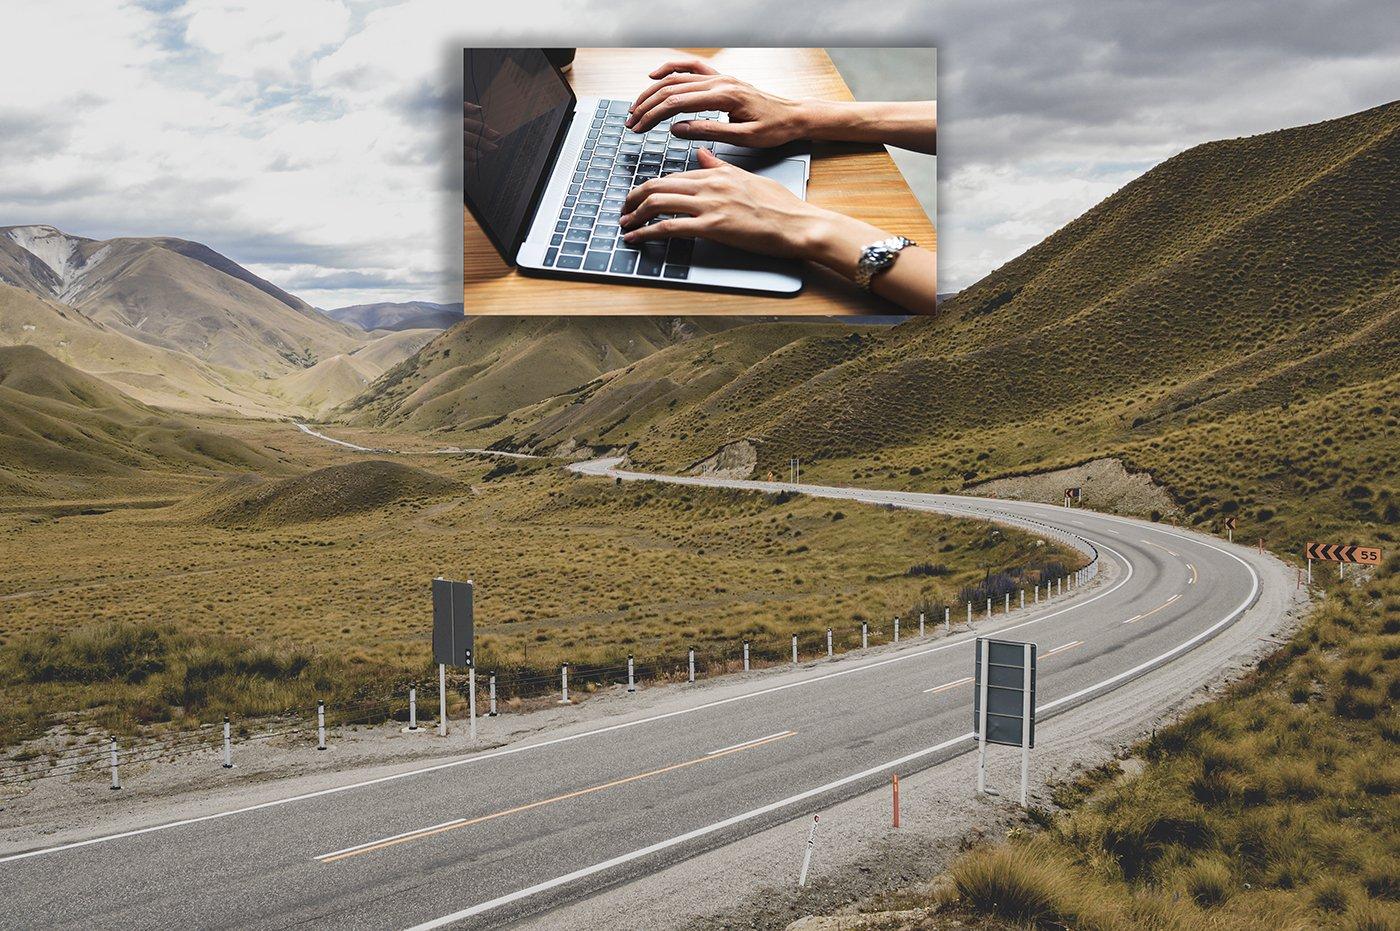 Race Track or Freeway